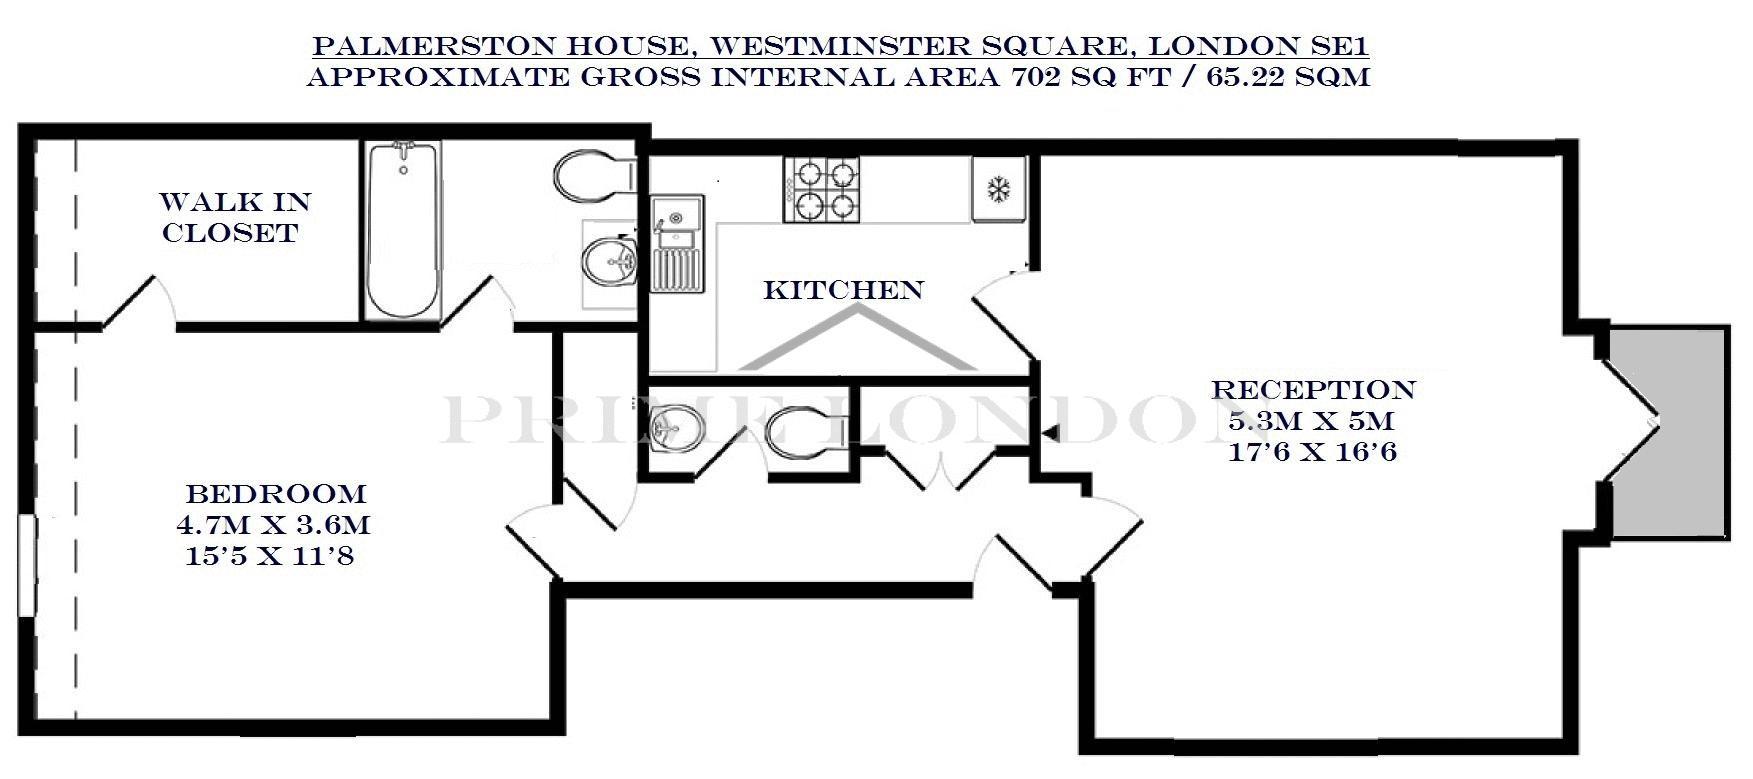 Palmerston House 126 Westminster Bridge Road